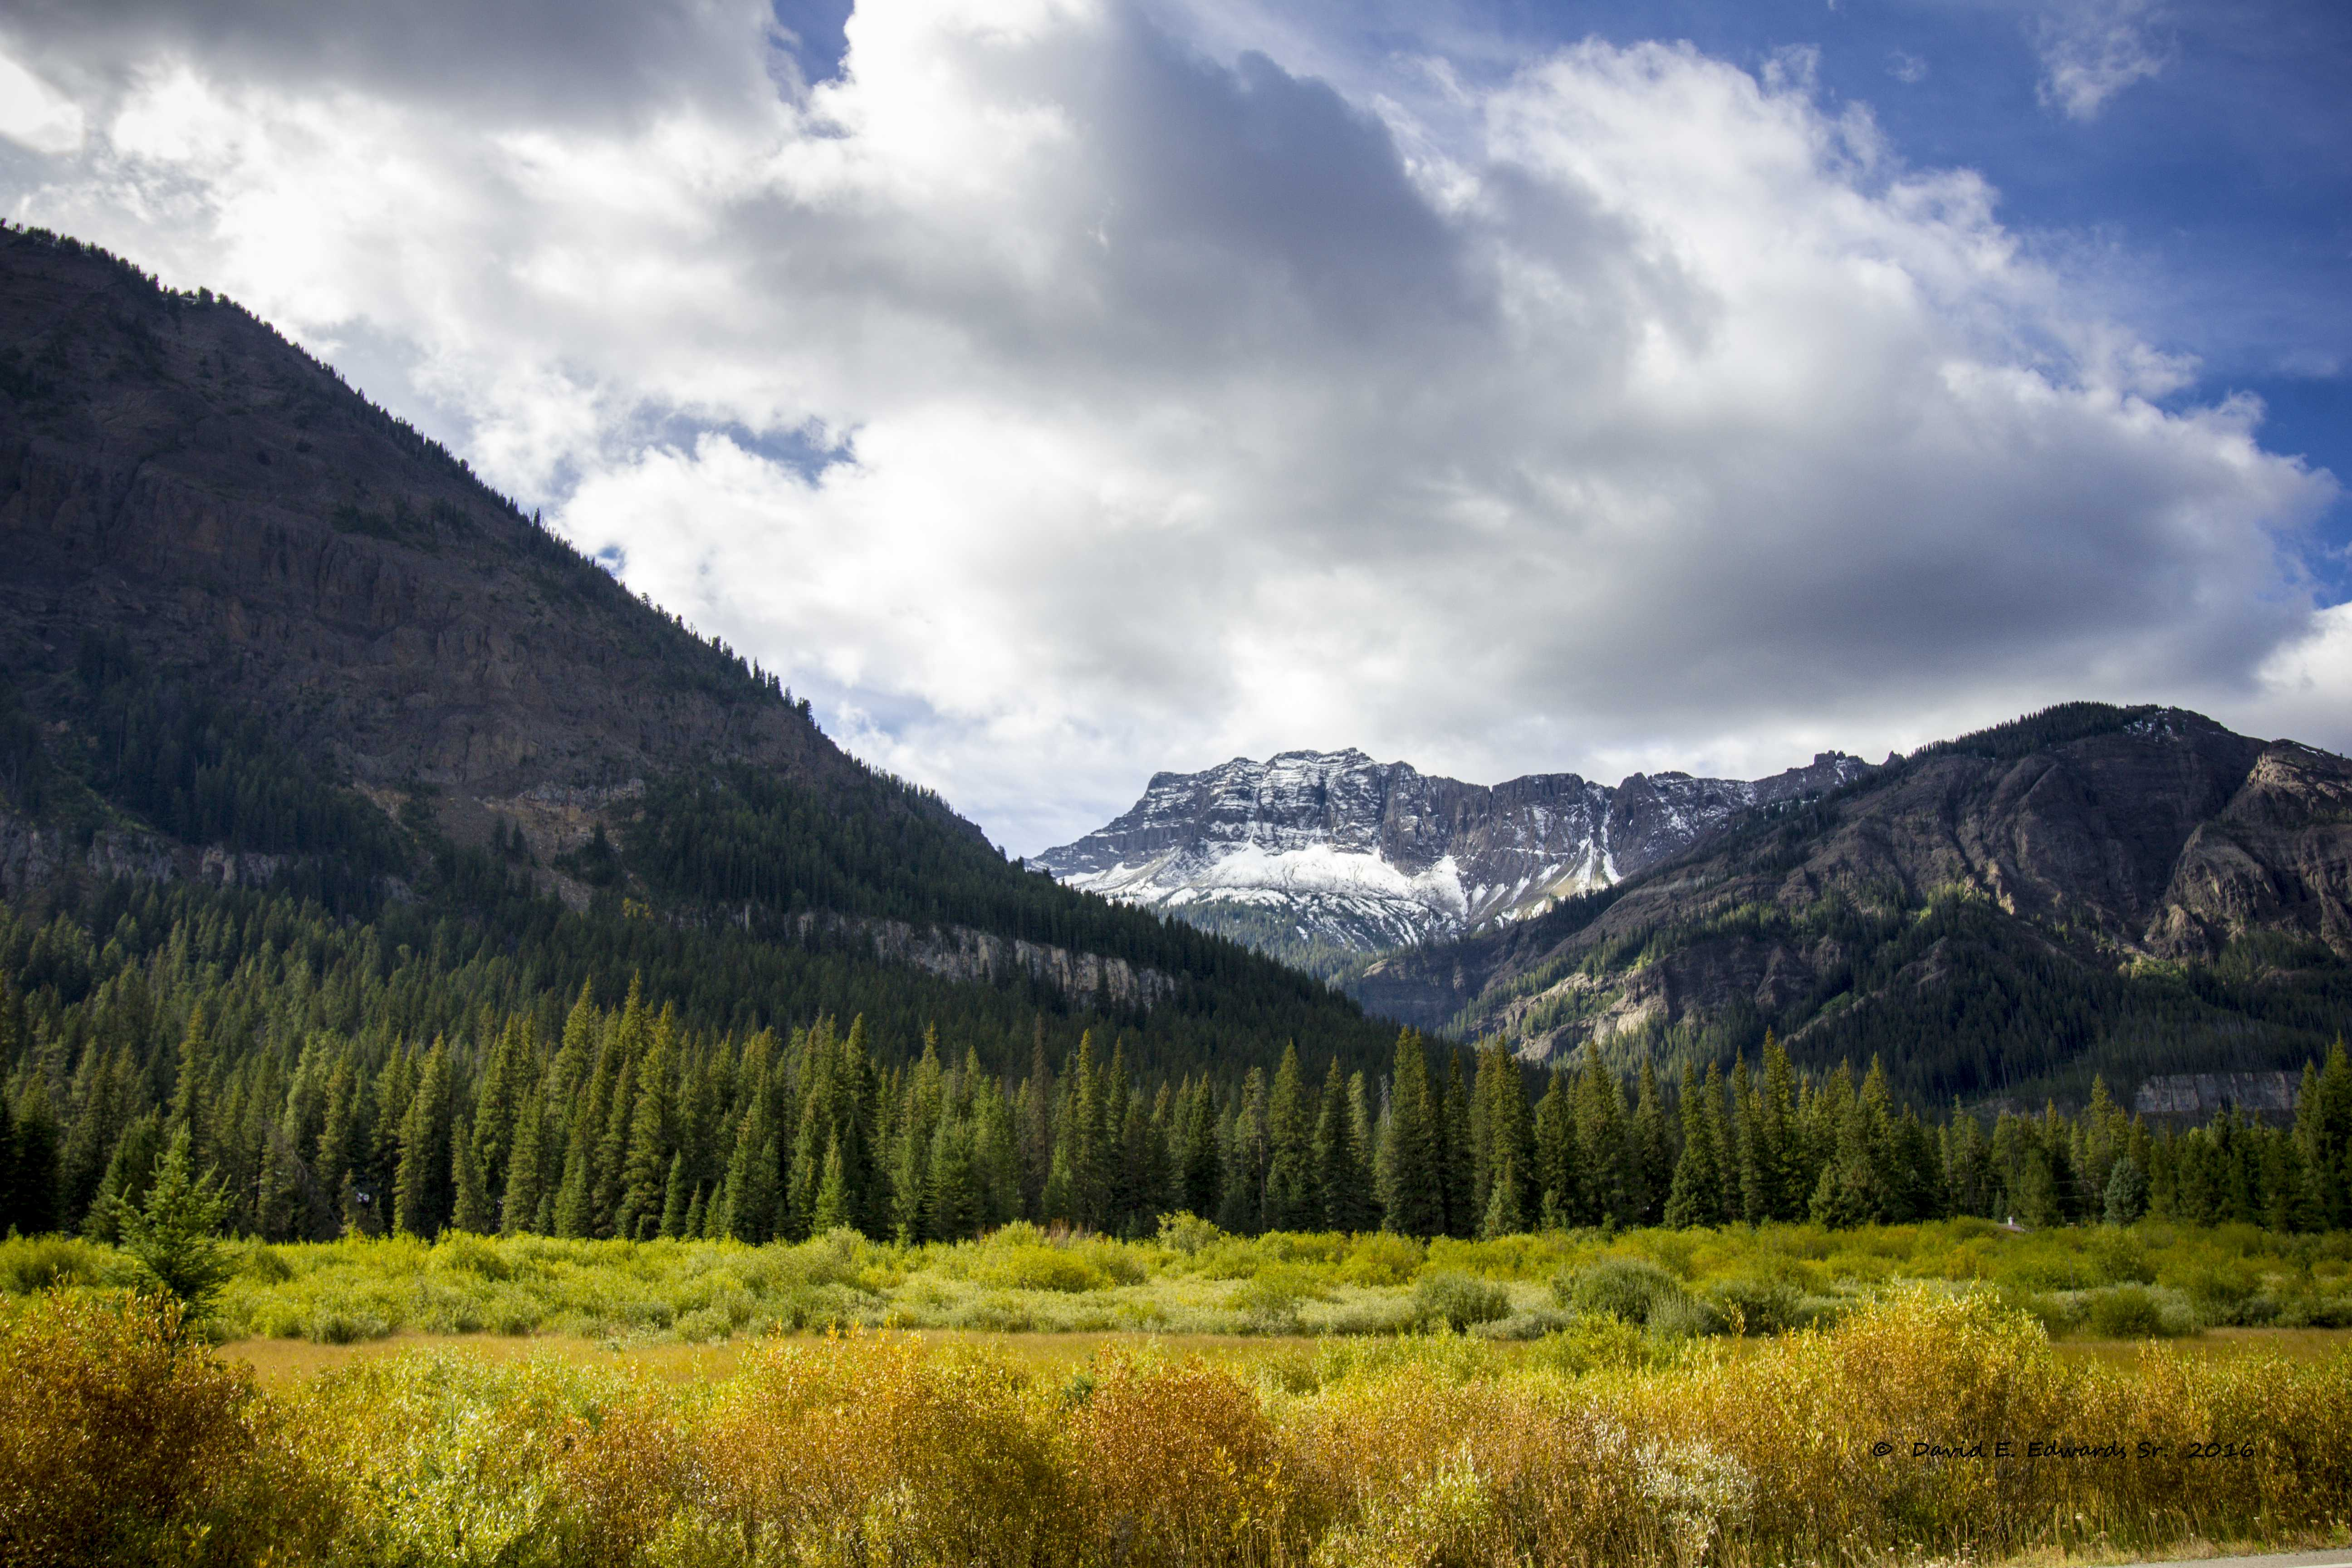 Yellowstone trip-  September 2016